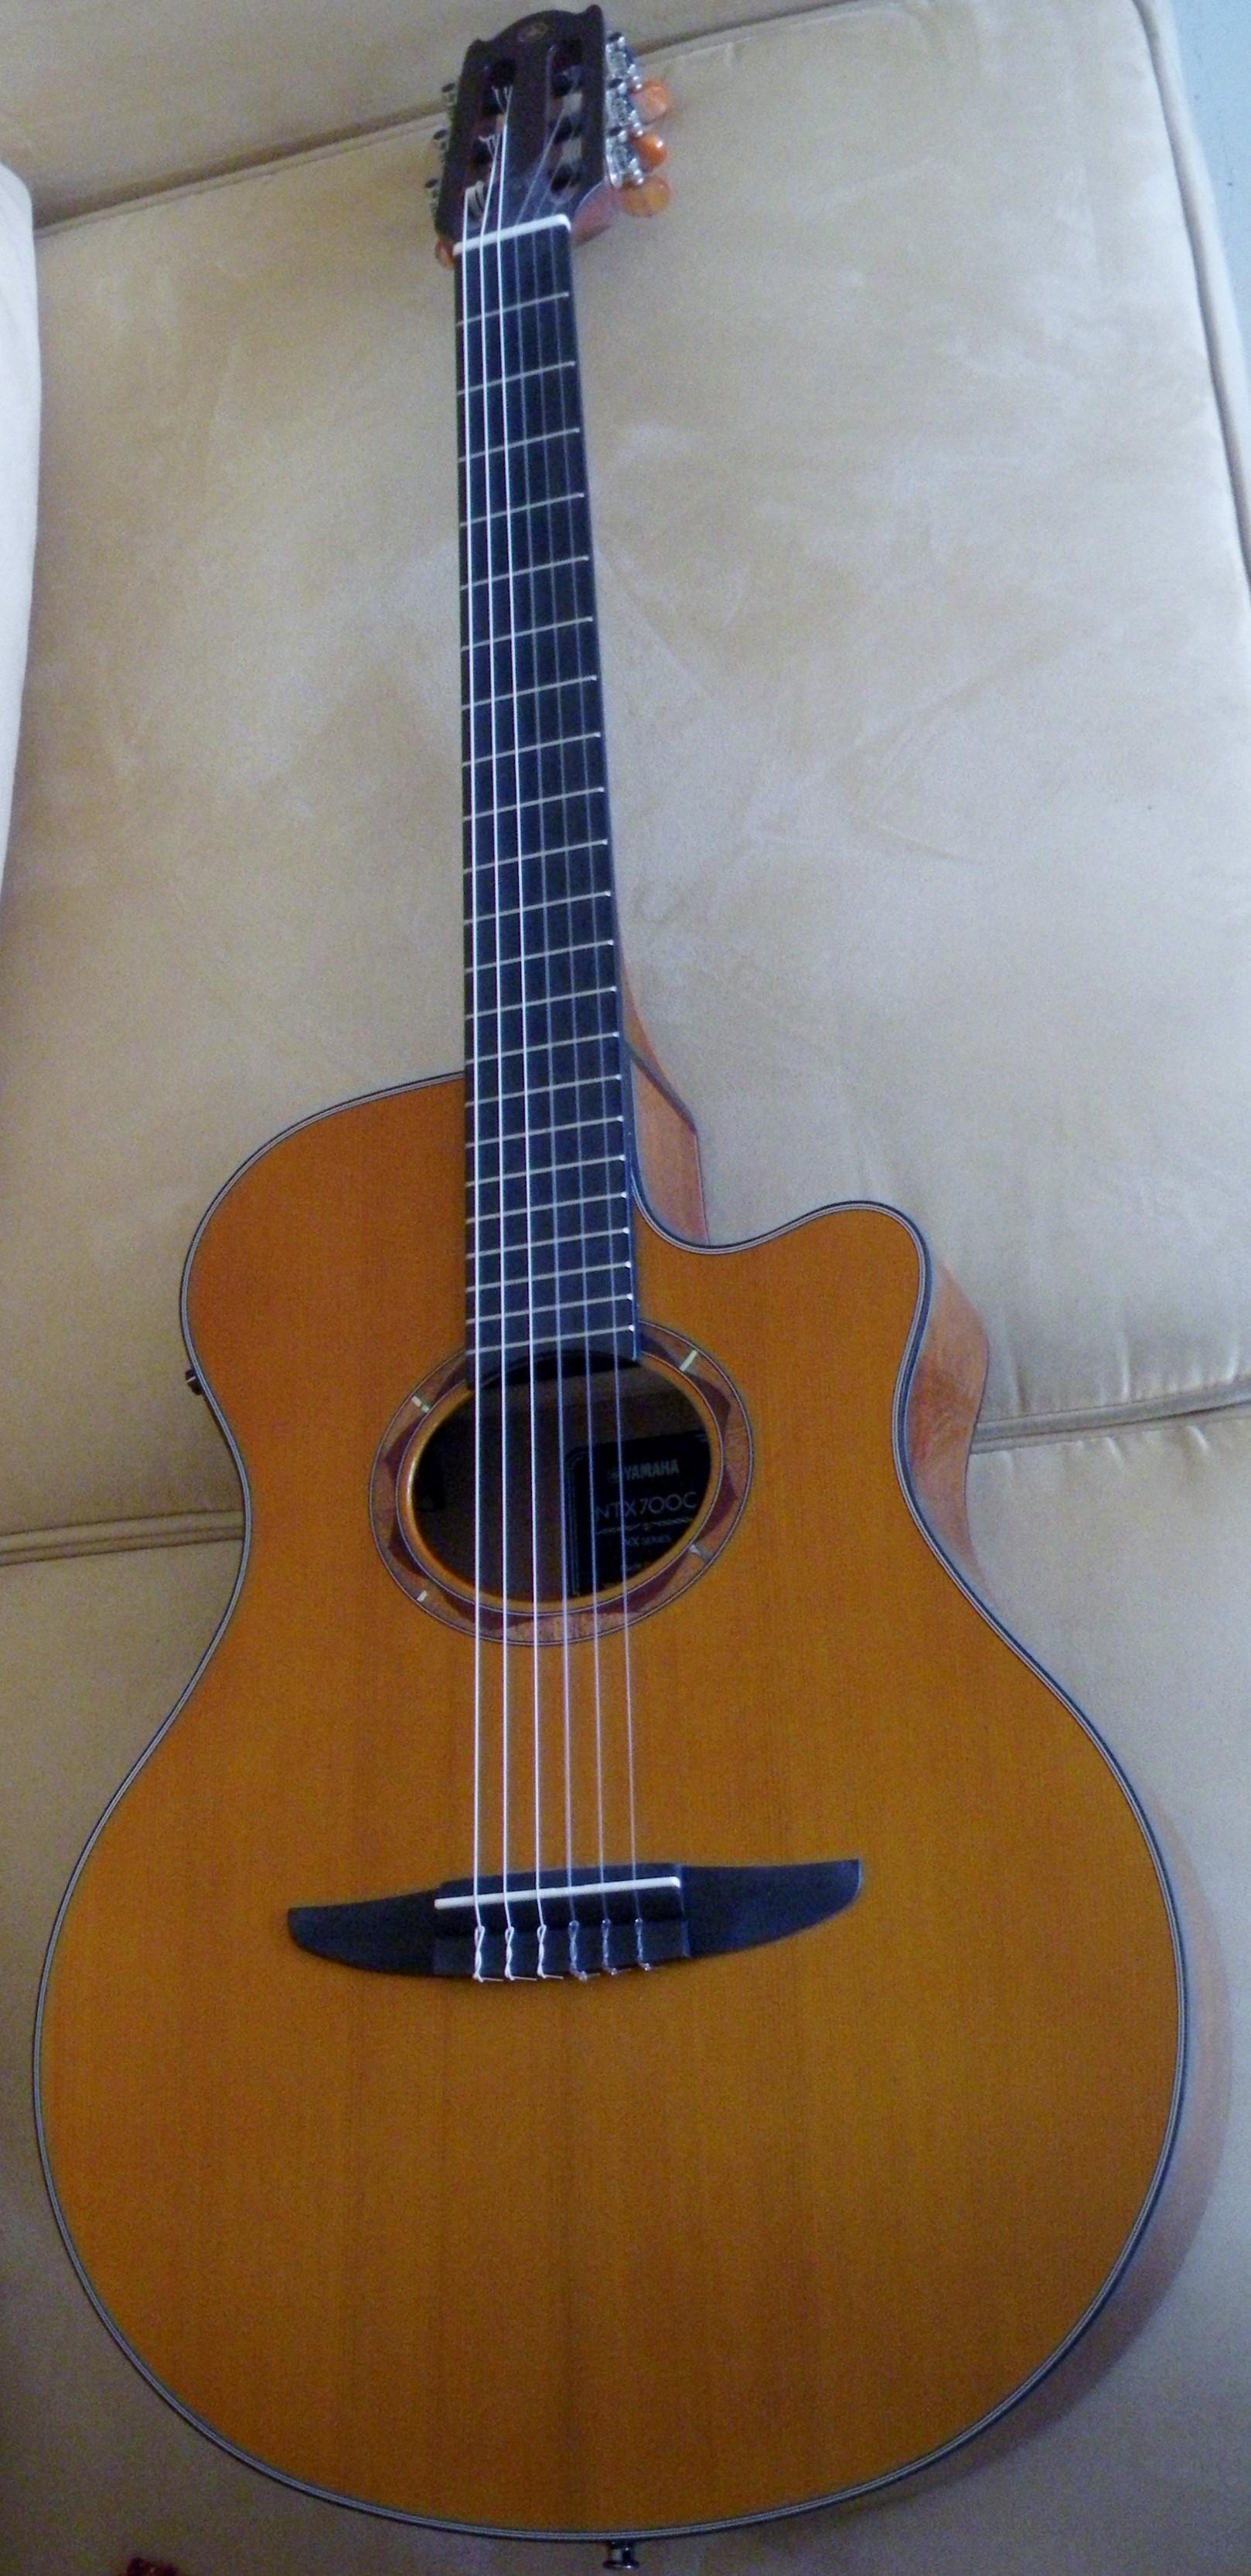 ntx 700 c dre guitare yamaha electro acoustique corde nylon languedoc roussillon audiofanzine. Black Bedroom Furniture Sets. Home Design Ideas